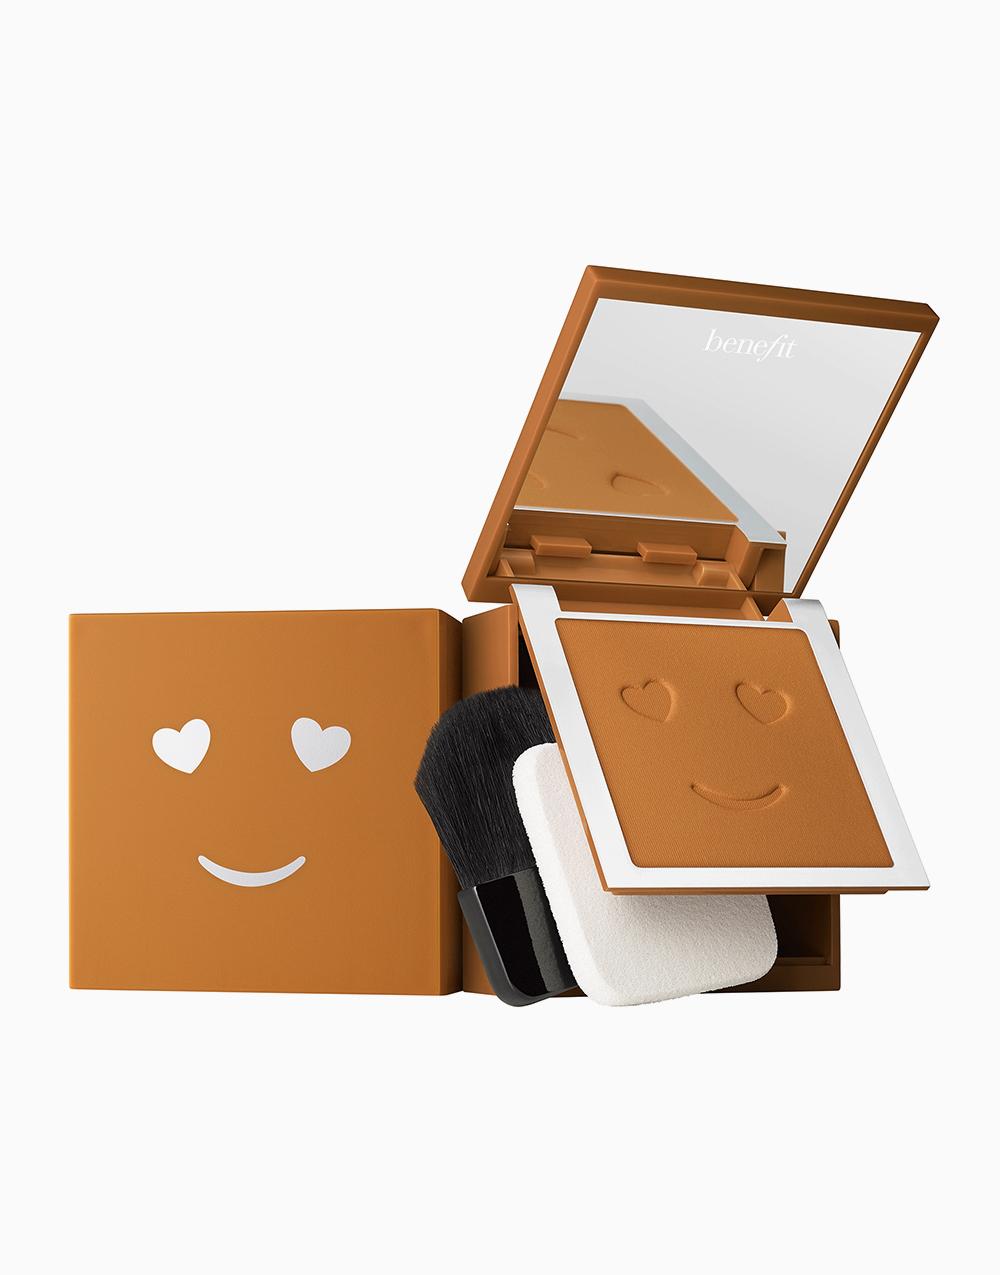 Hello Happy Velvet Powder Foundation by Benefit | Shade 10